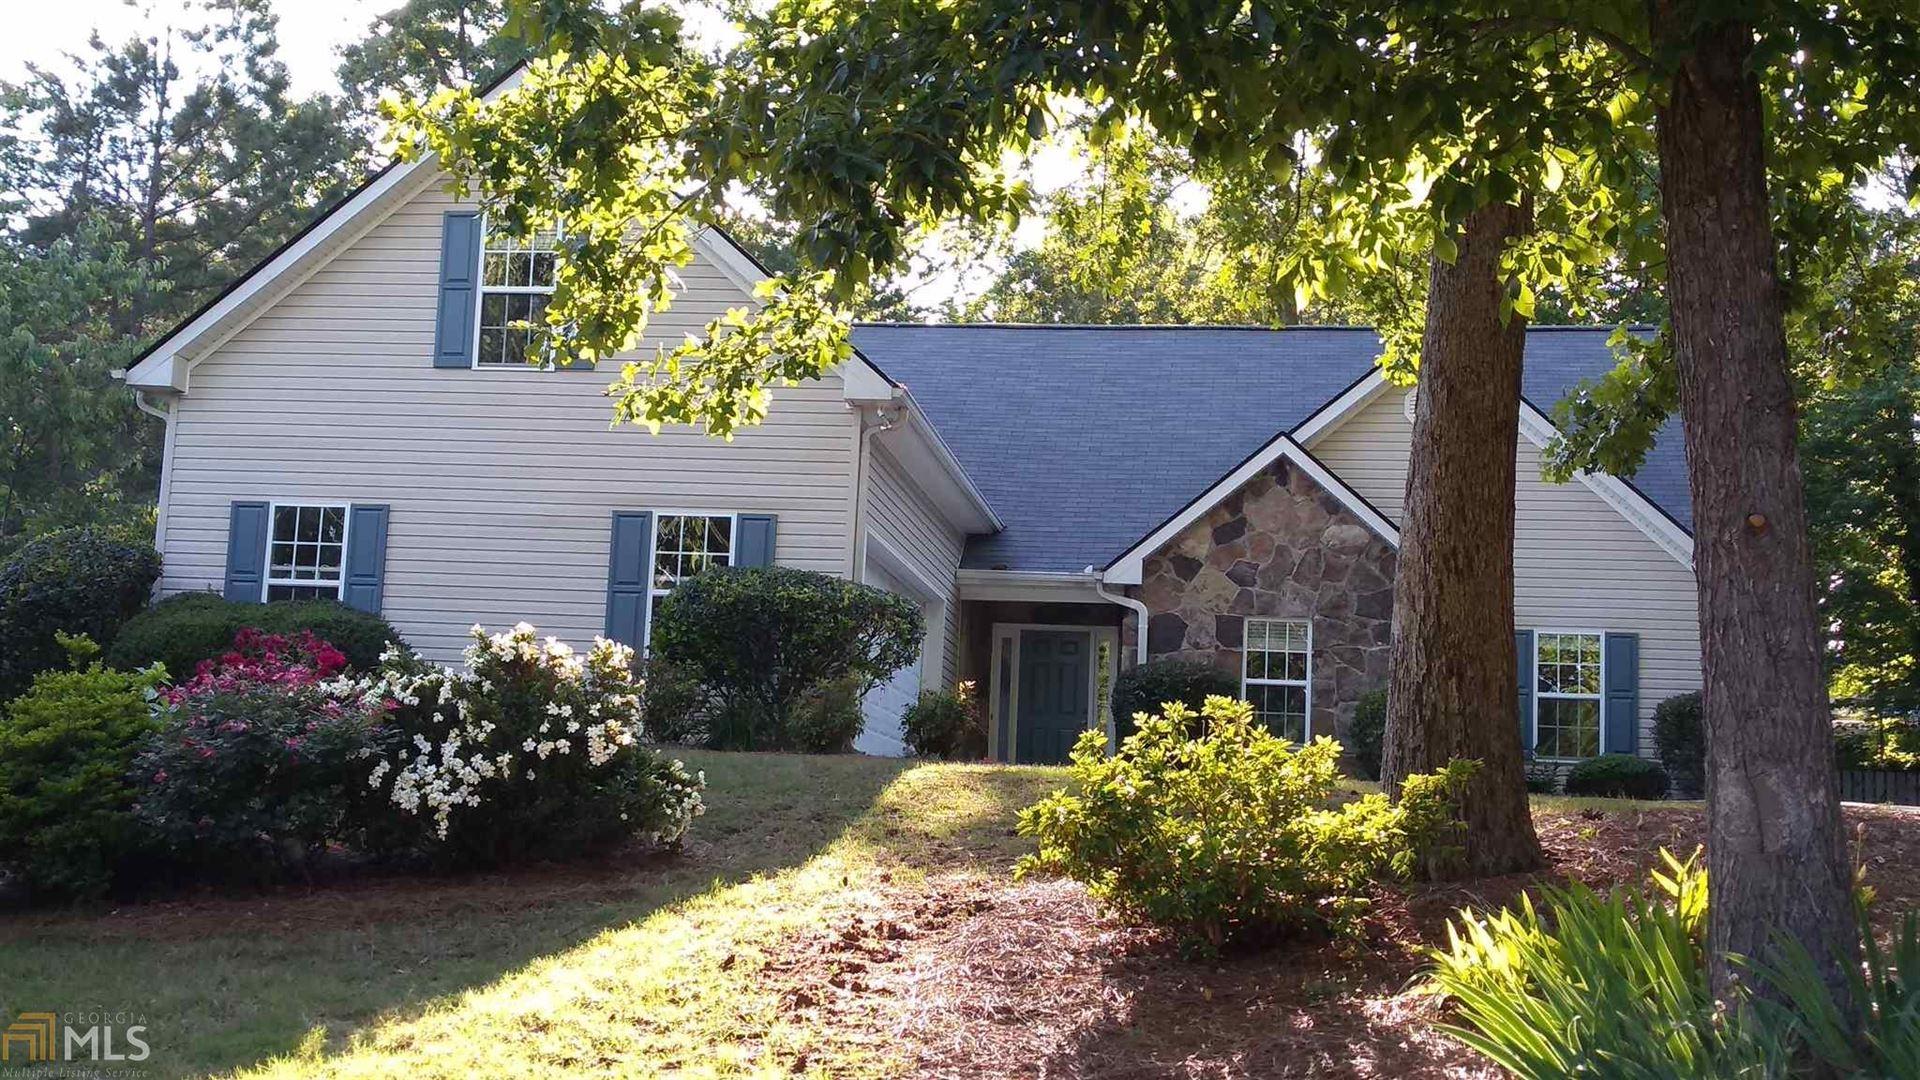 3499 Oseola Trl, Gainesville, GA 30506 - MLS#: 8789605